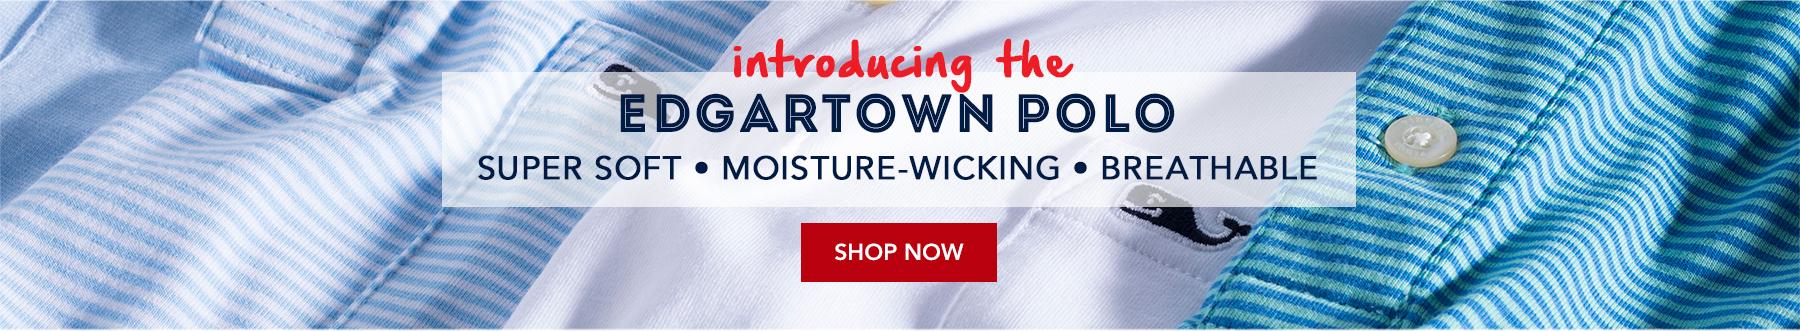 Introducing the Edgartown Polo. Shop Now.